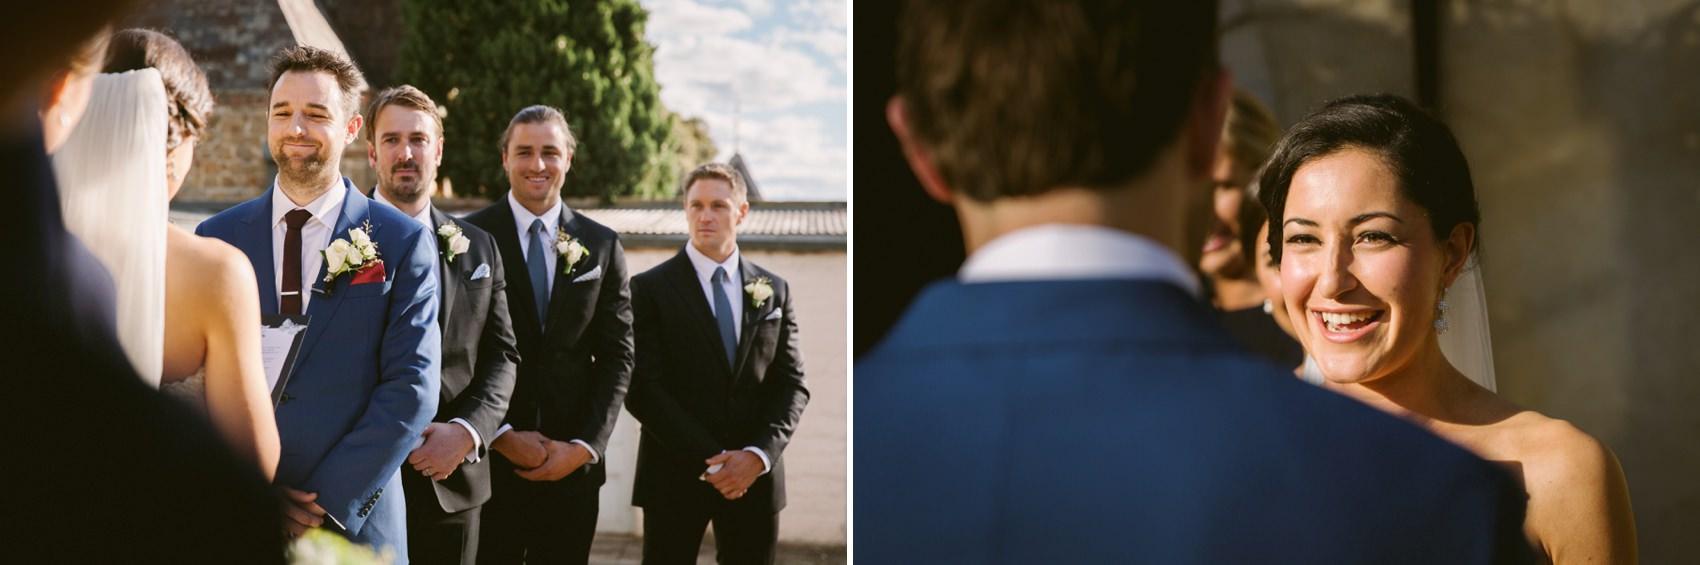 Montsalvat-Wedding-Photography_0140